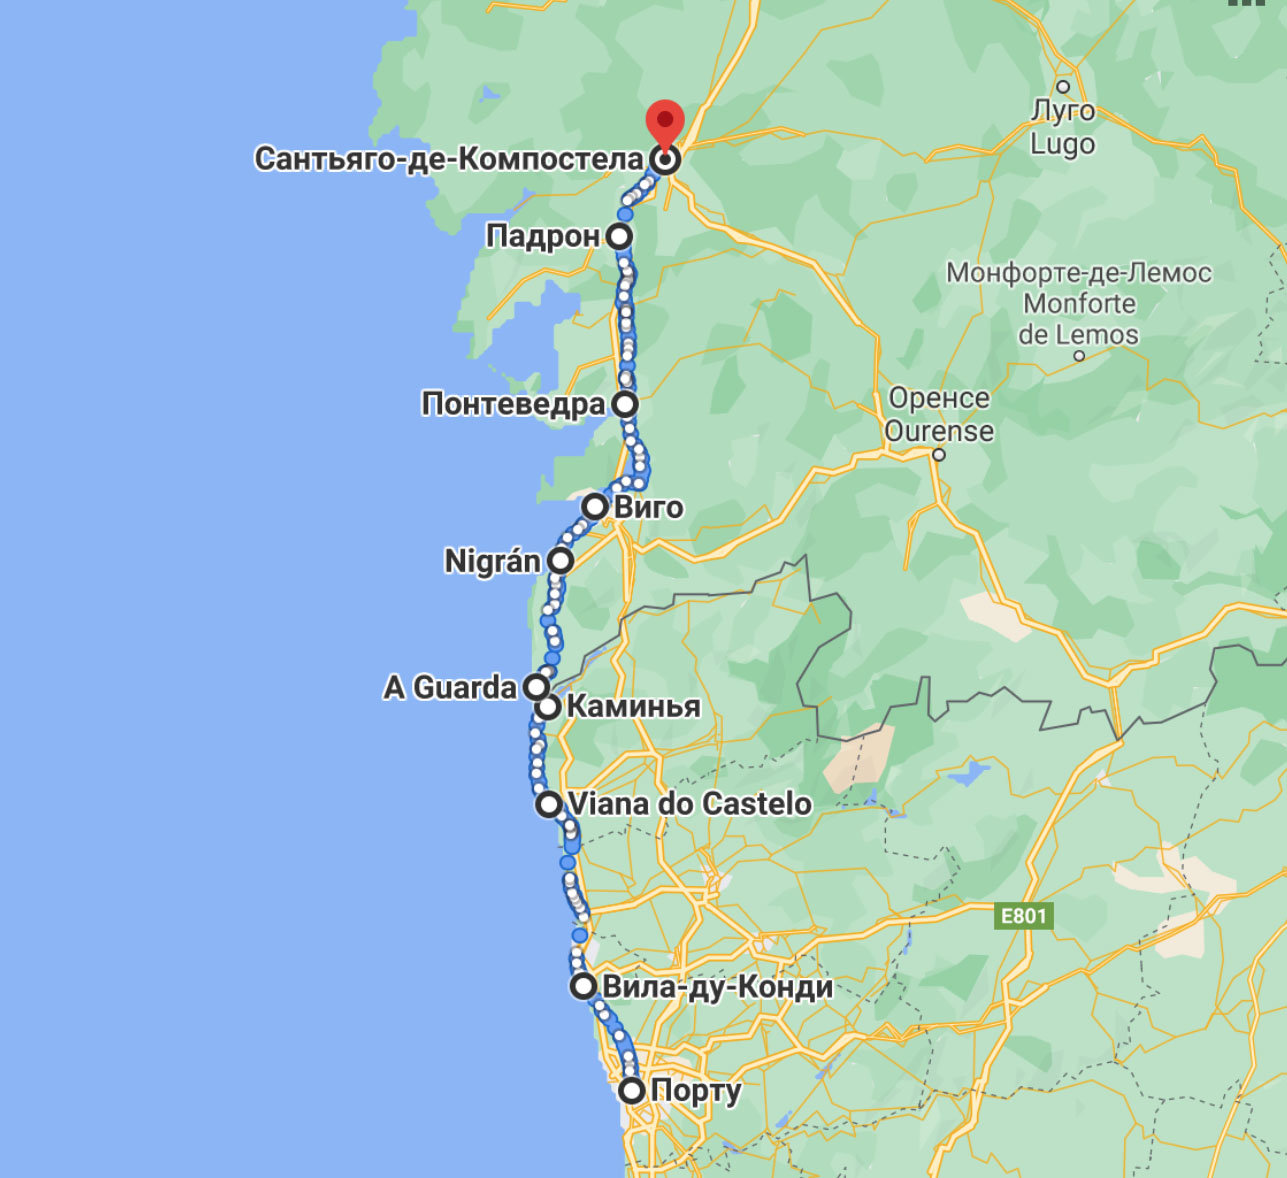 mapa.jpg.944ea3a49d8b013519a8b6258e9e660a.jpg